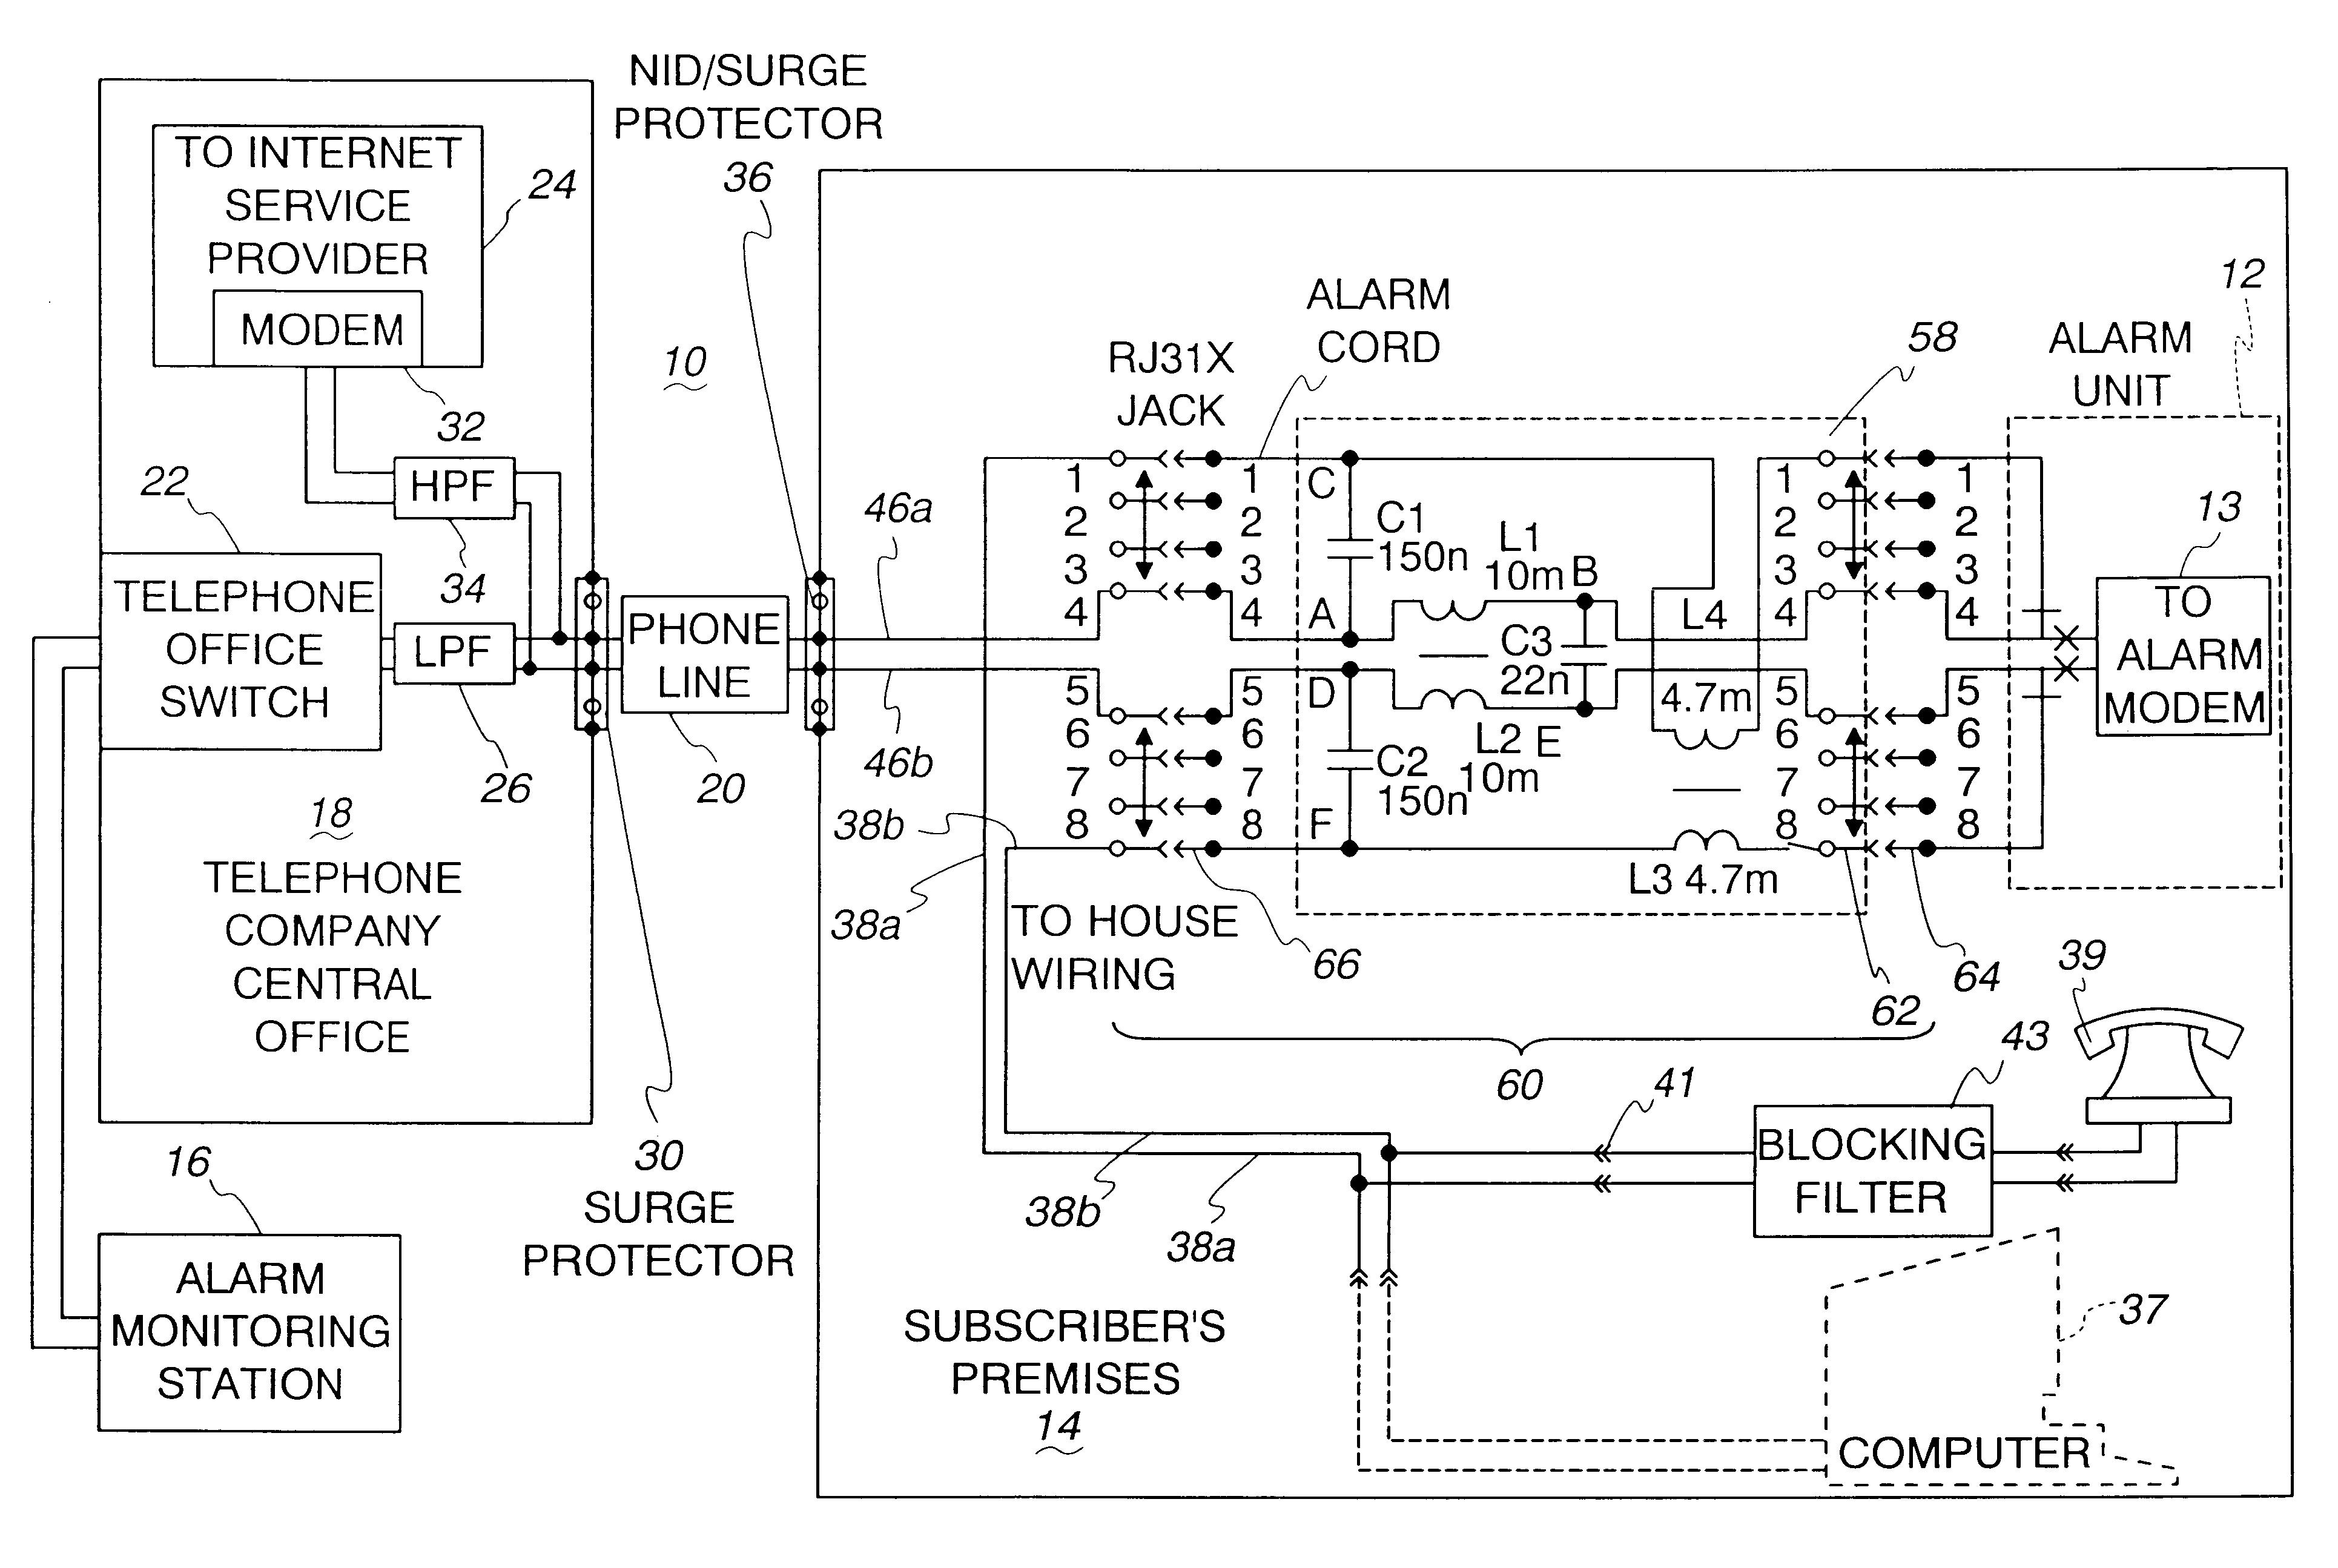 Rj31x Wiring Diagram Diagrams 620 Electrical Drawing U2022 Rj11 Jack Perfect